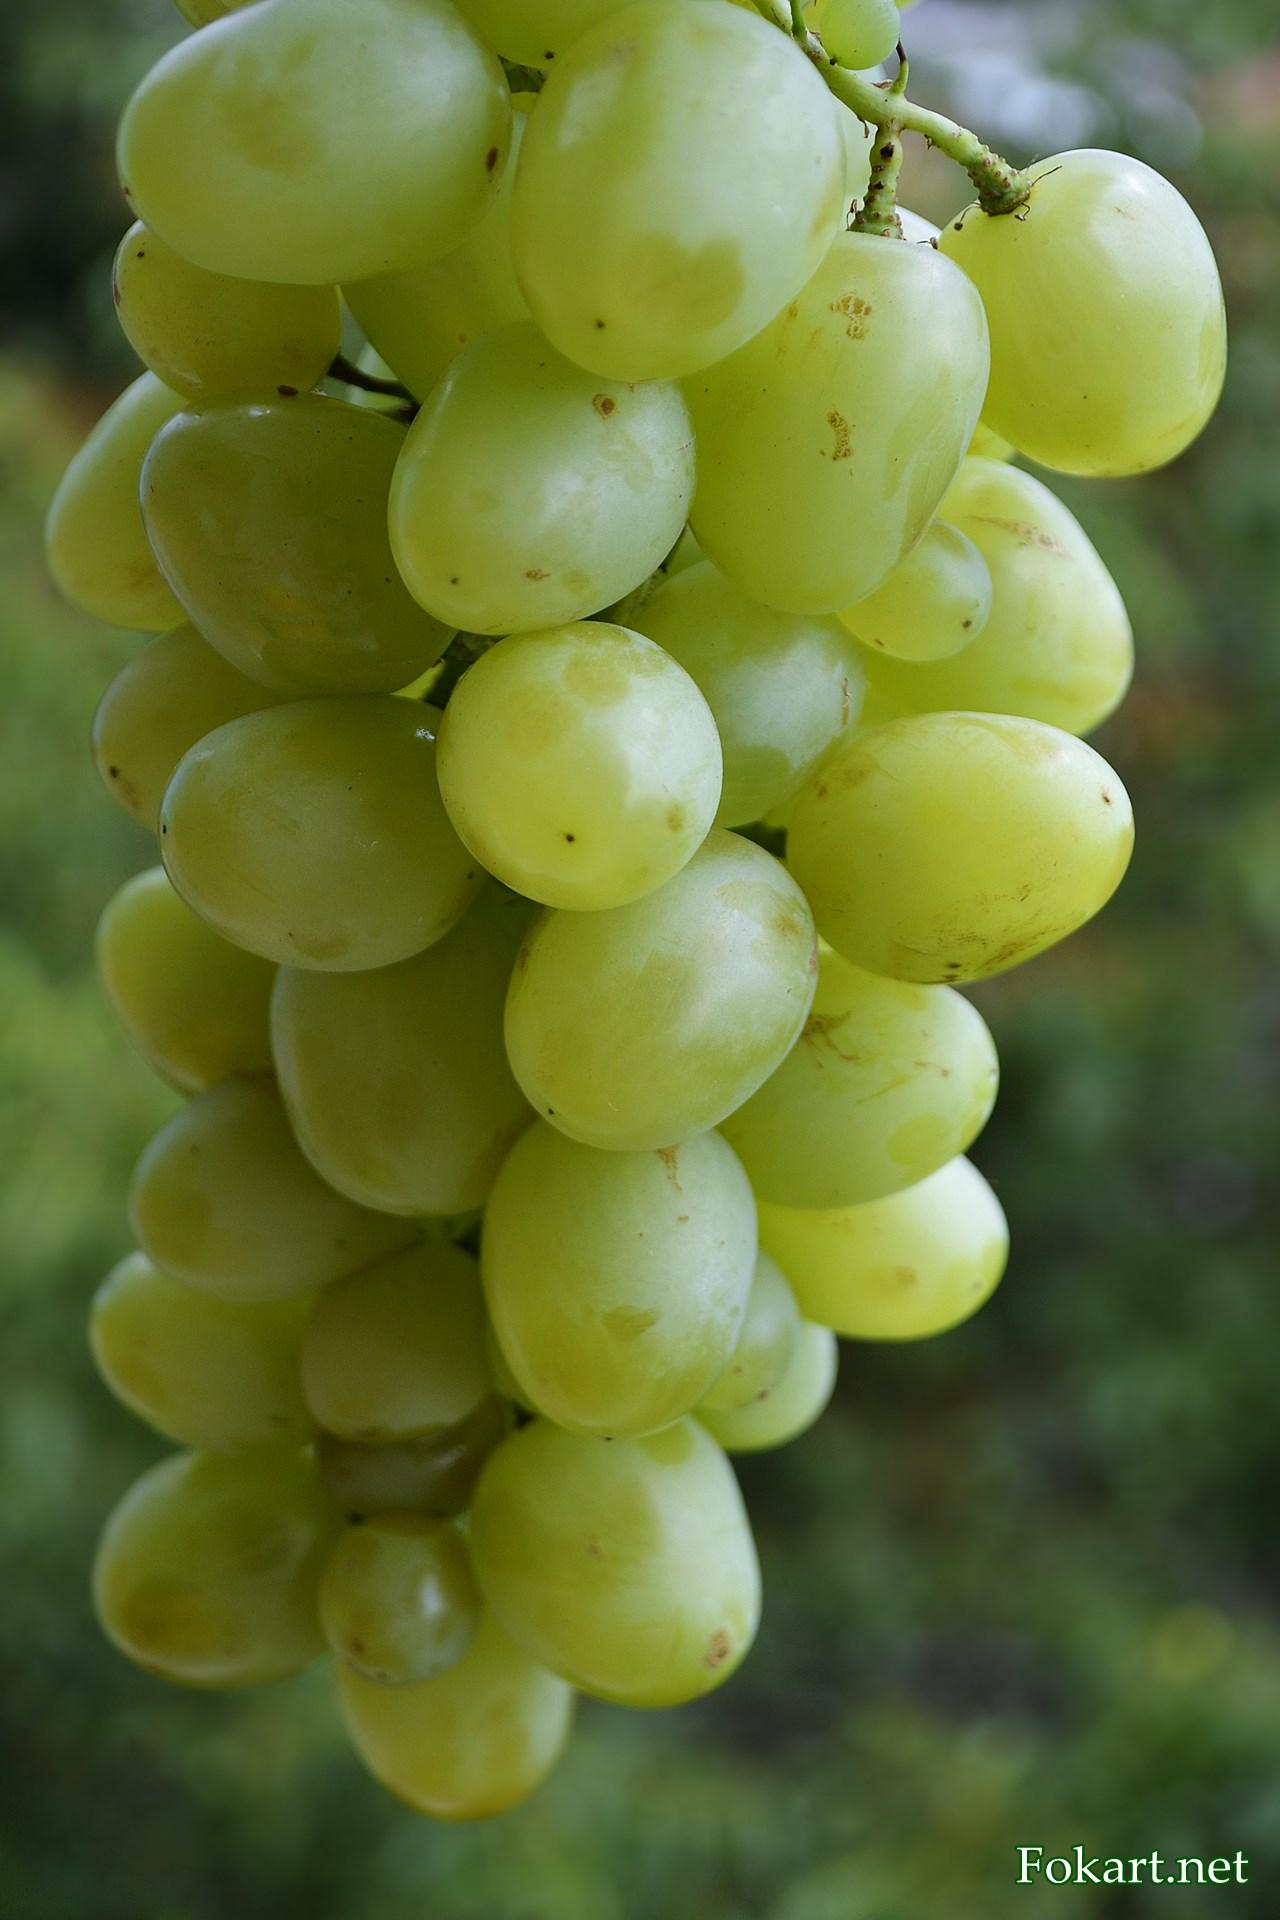 Гроздь крупного светлого винограда на фоне зелени